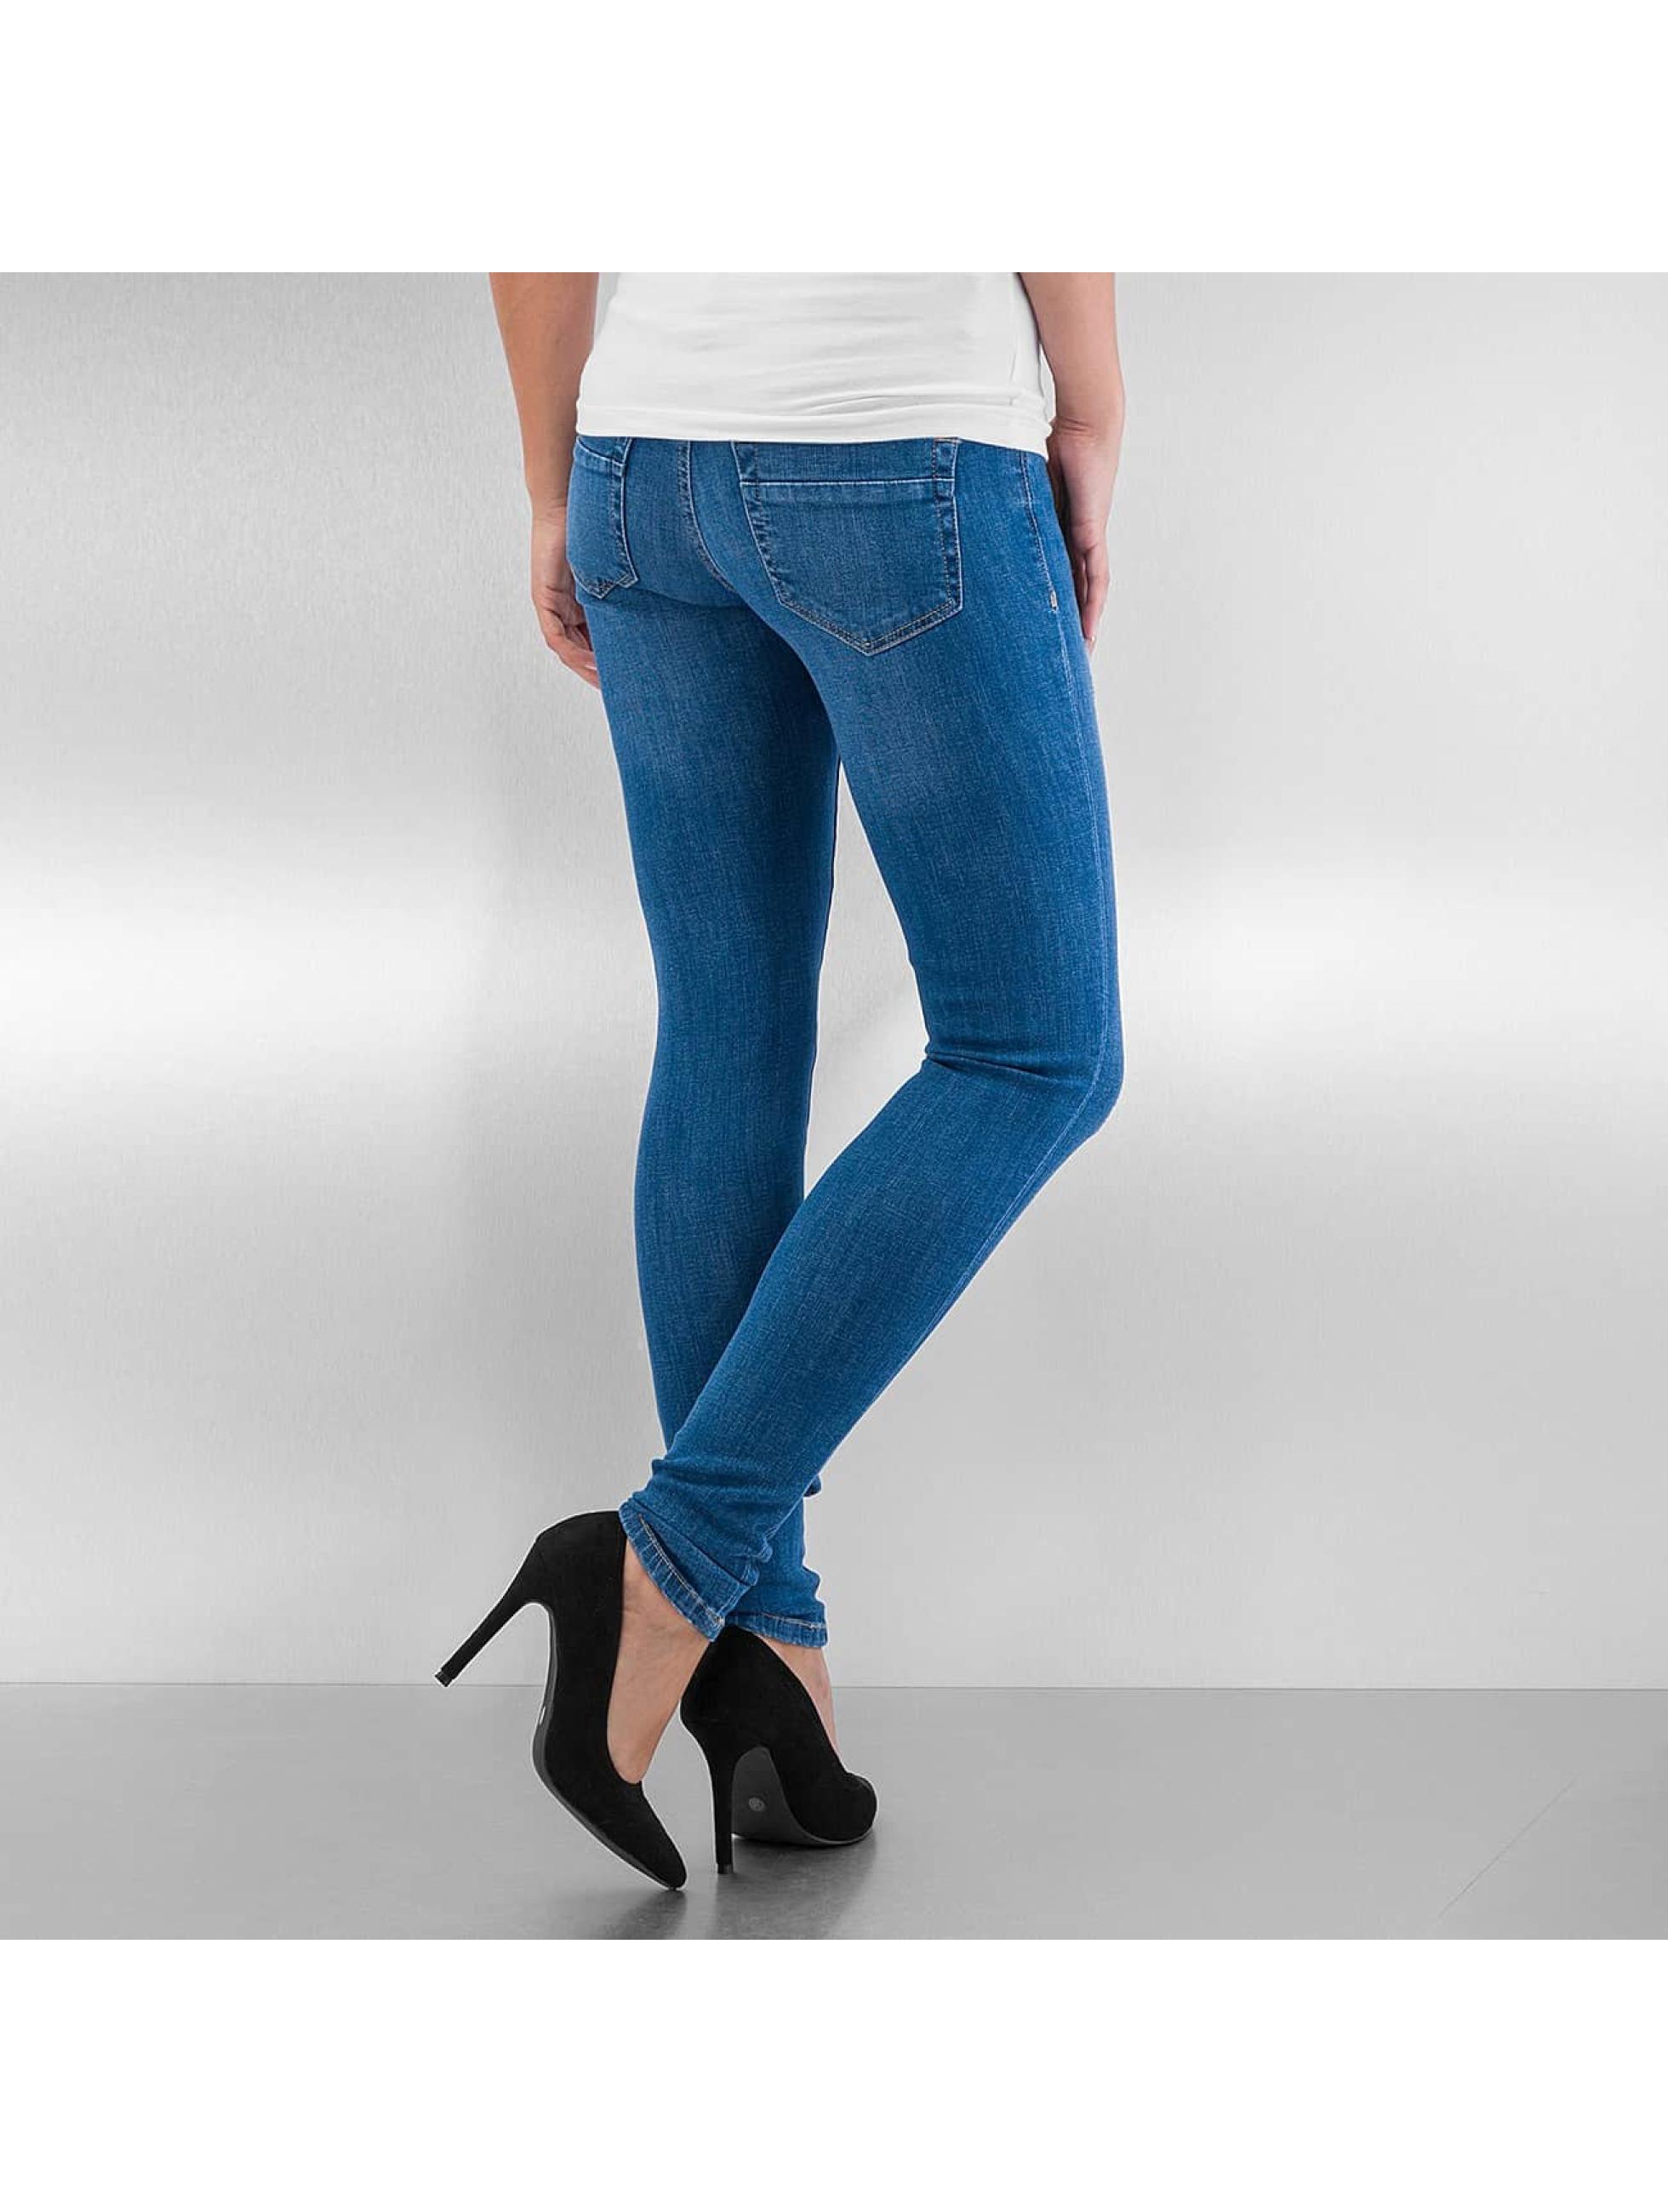 Urban Classics Облегающие джинсы Ripped Denim синий